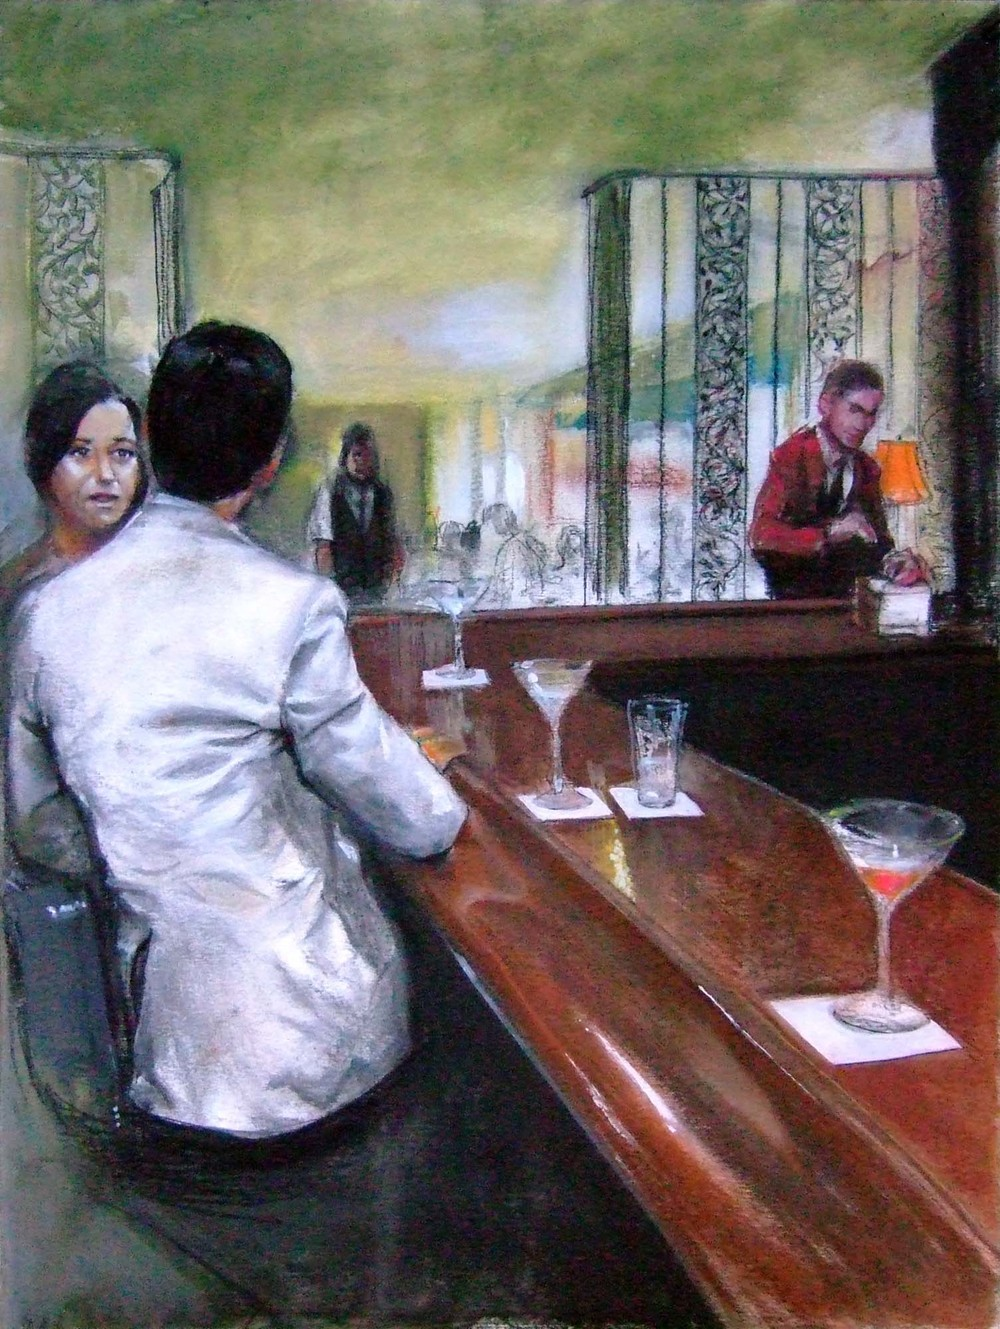 At the bar, Gene's